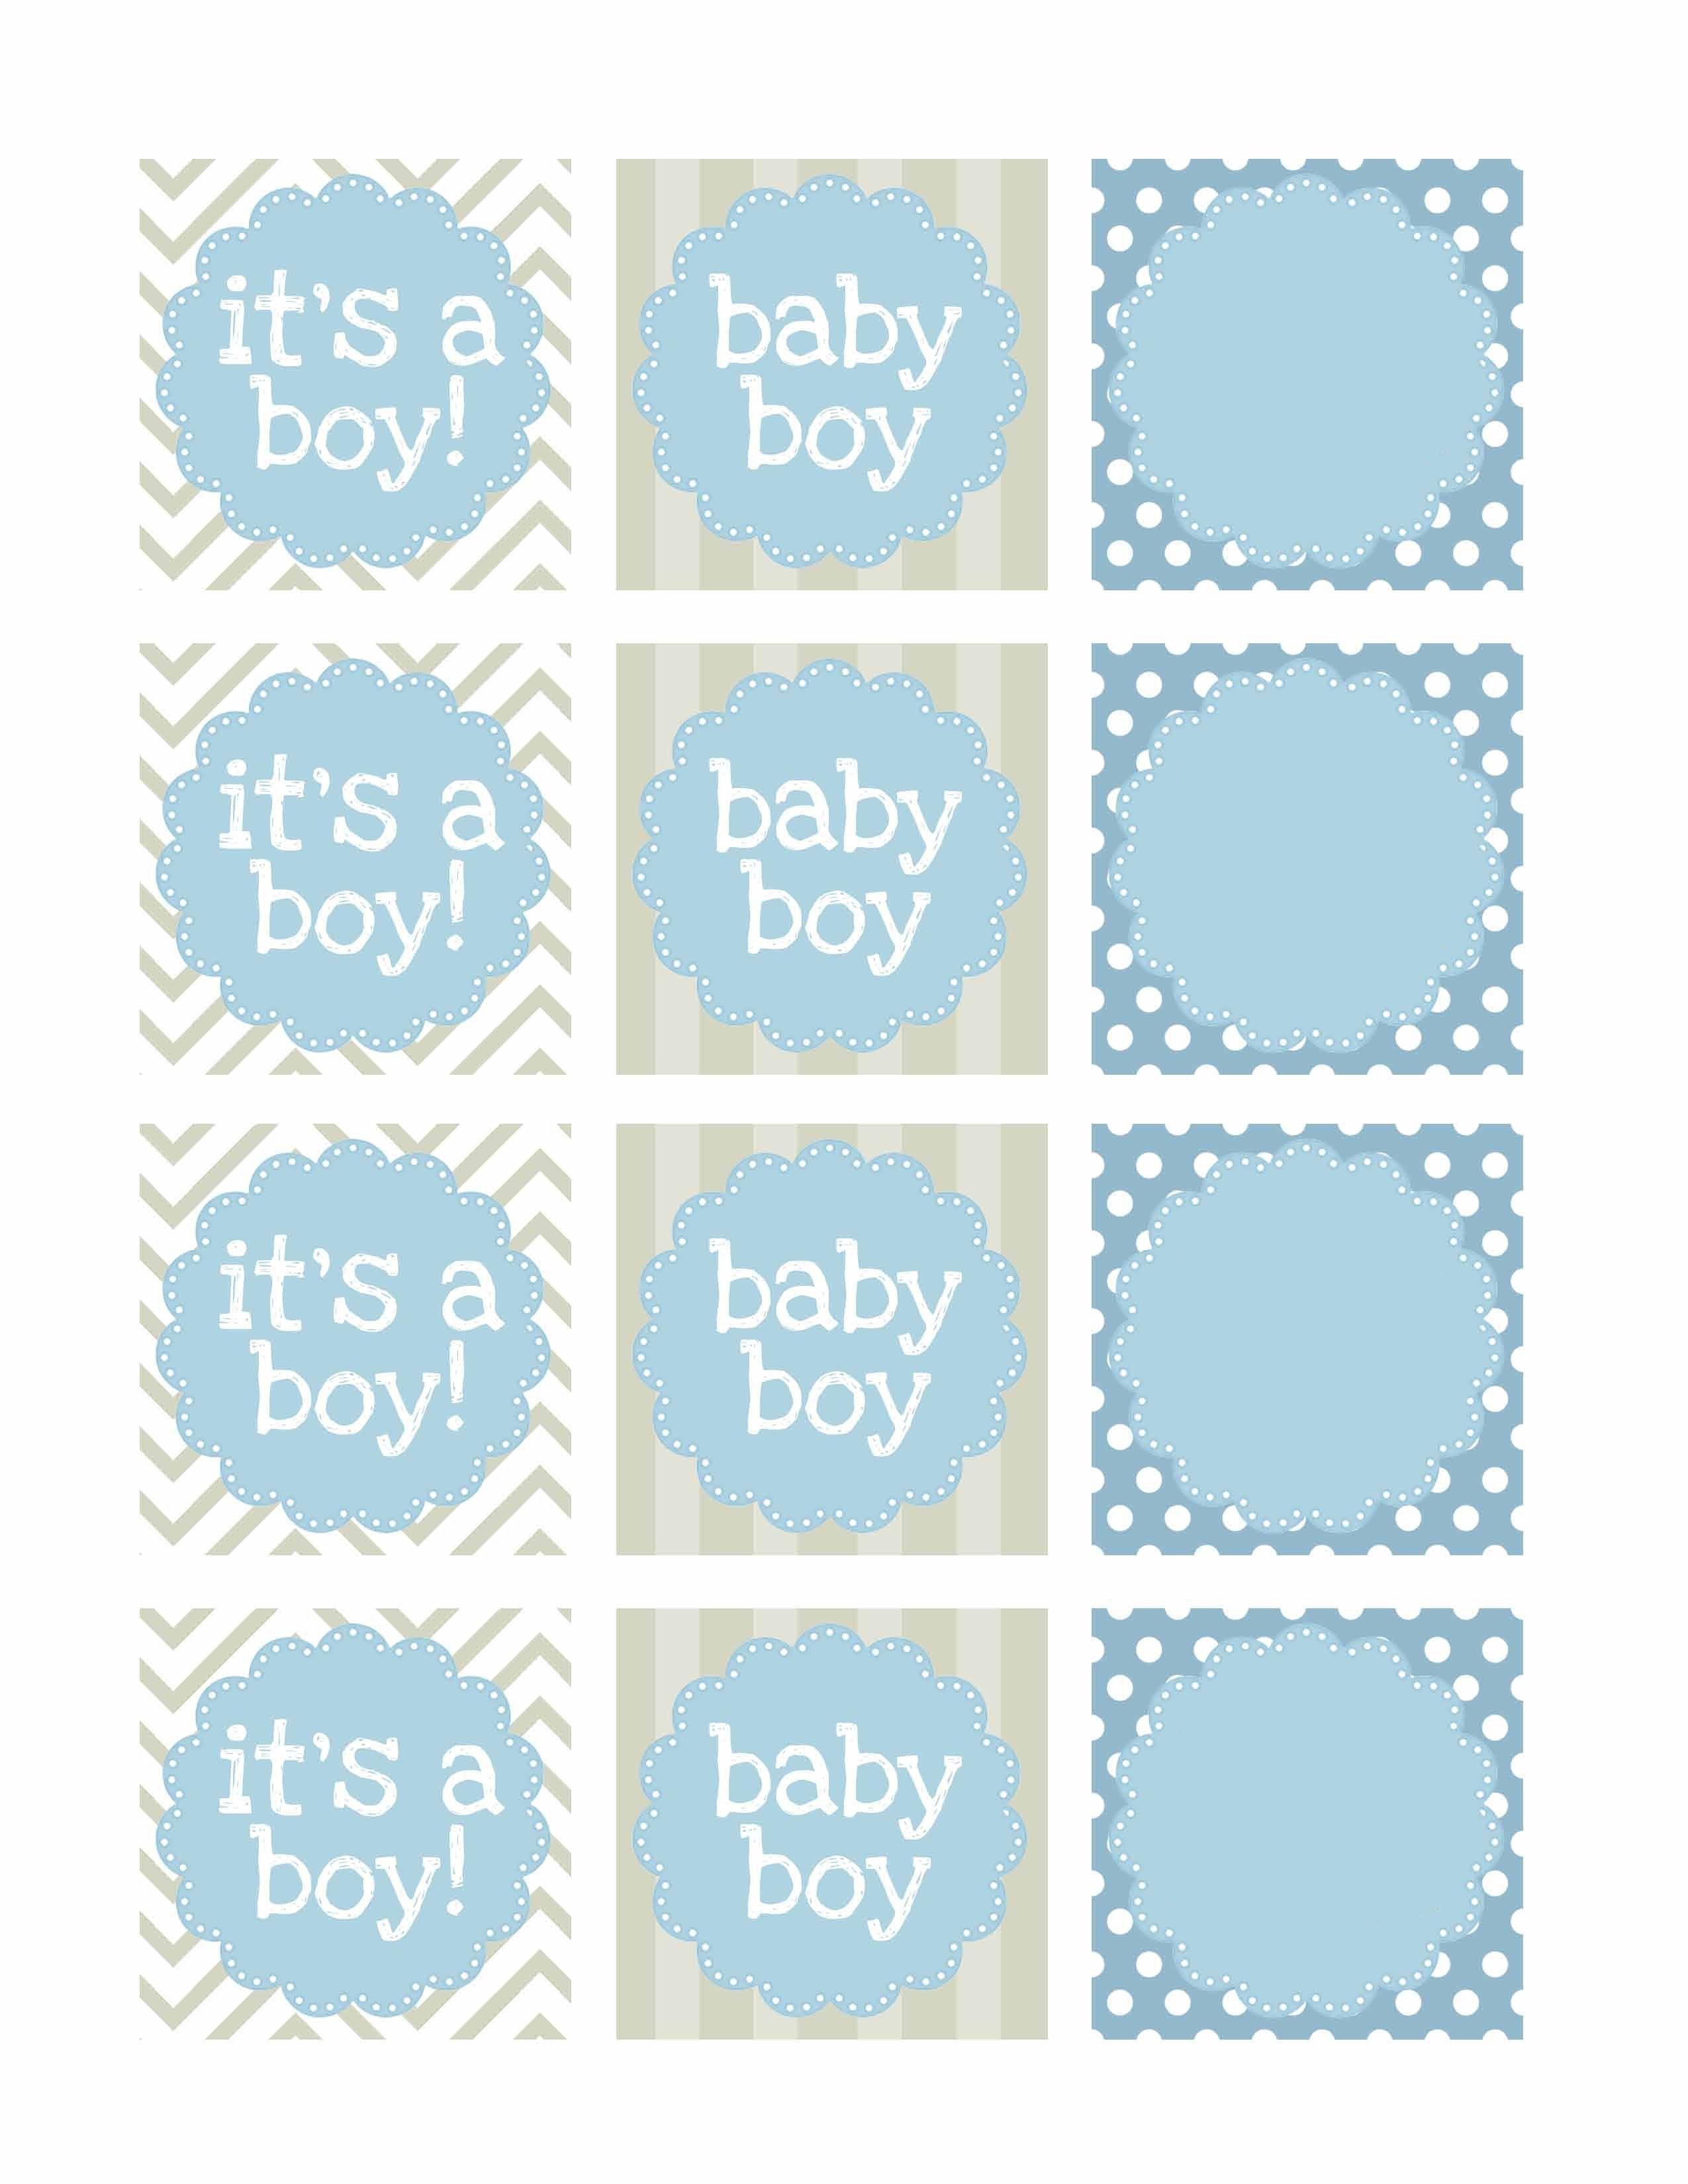 Boy Baby Shower Free Printables | Unbedingt Mal Ausprobieren | Free - Free Baby Shower Printables Decorations